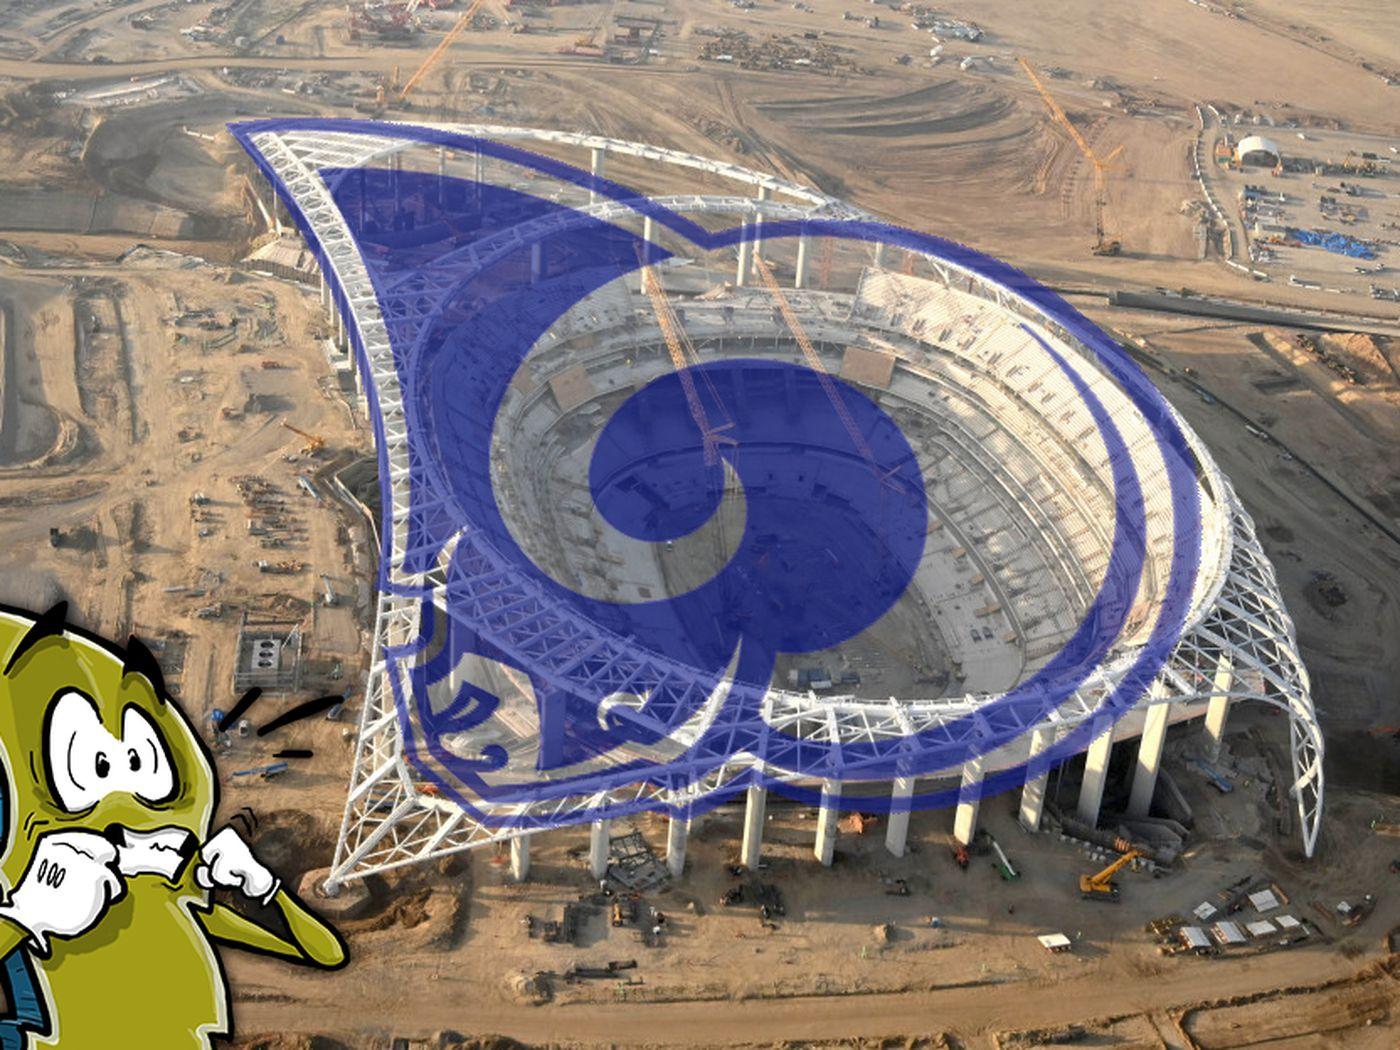 Stadium Talk: Does SoFi Stadium look like the Rams logo? - Bolts ...